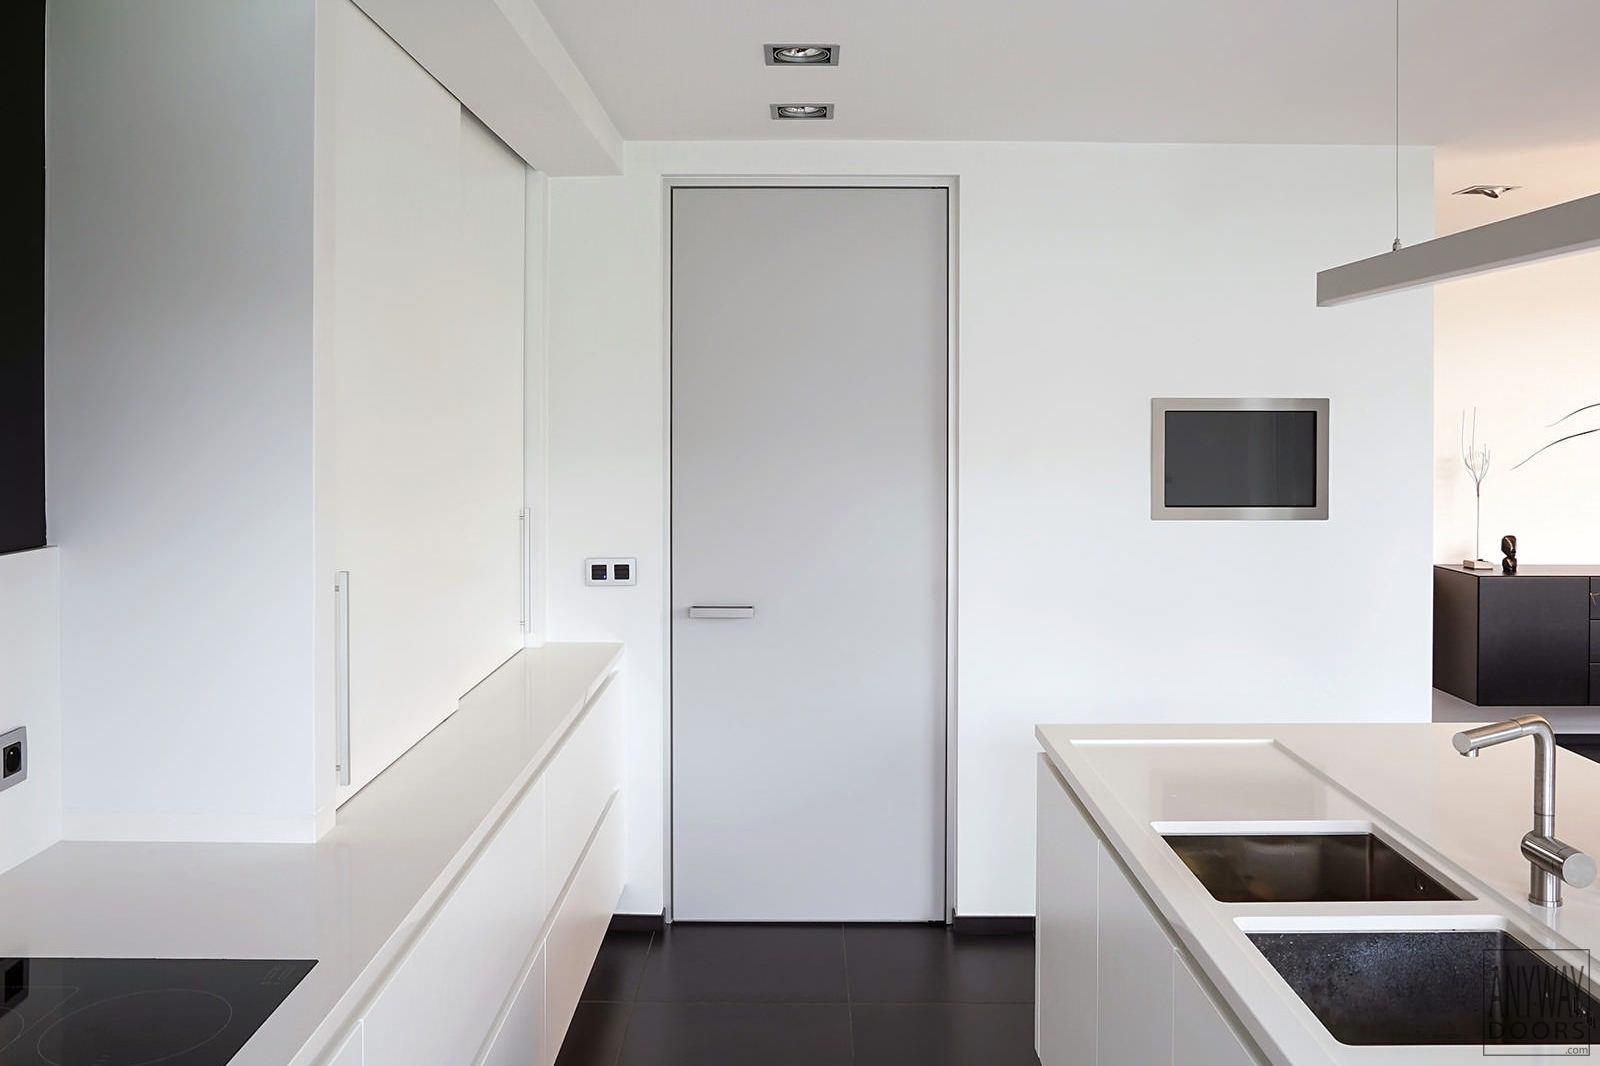 De Goedkoopste Deuren : Volle deur anyway doors avc gemino